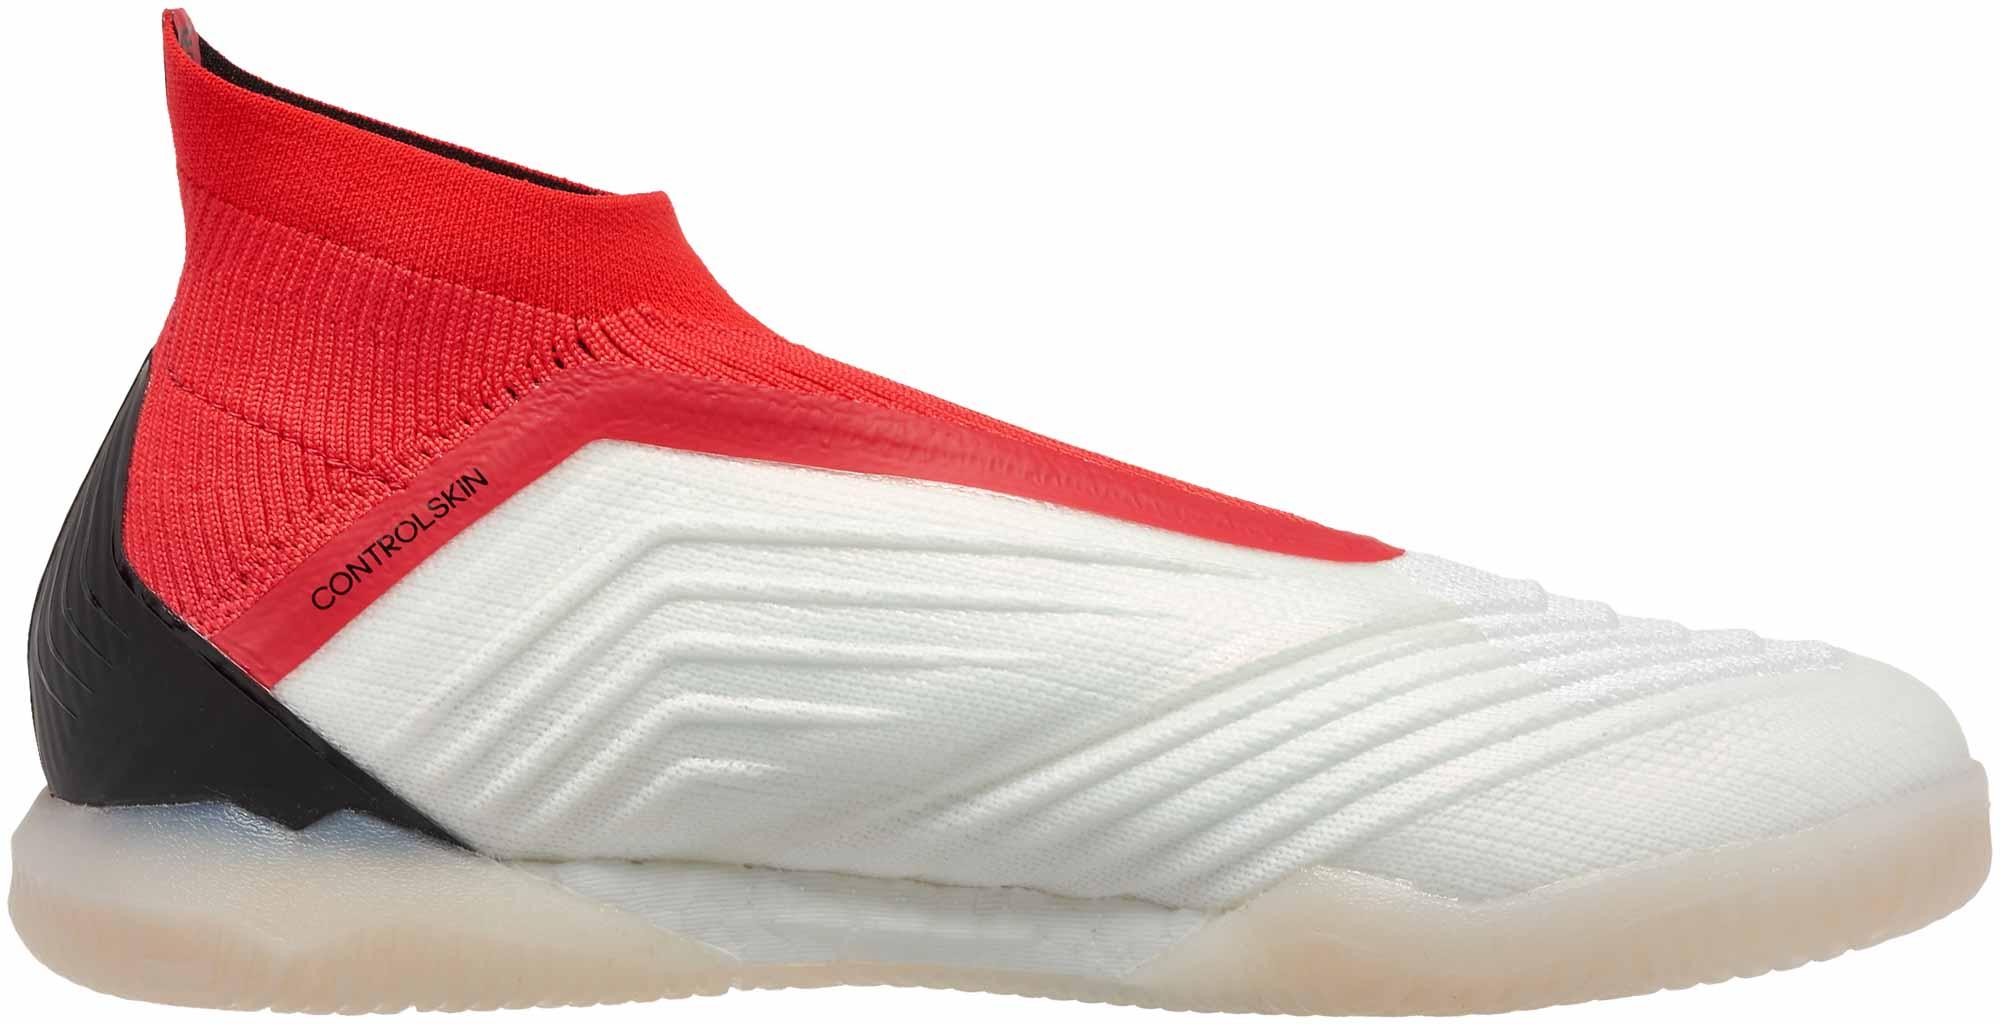 2ea7b27d7 adidas Predator Tango 18+ IN - White   Real Coral - Soccer Master